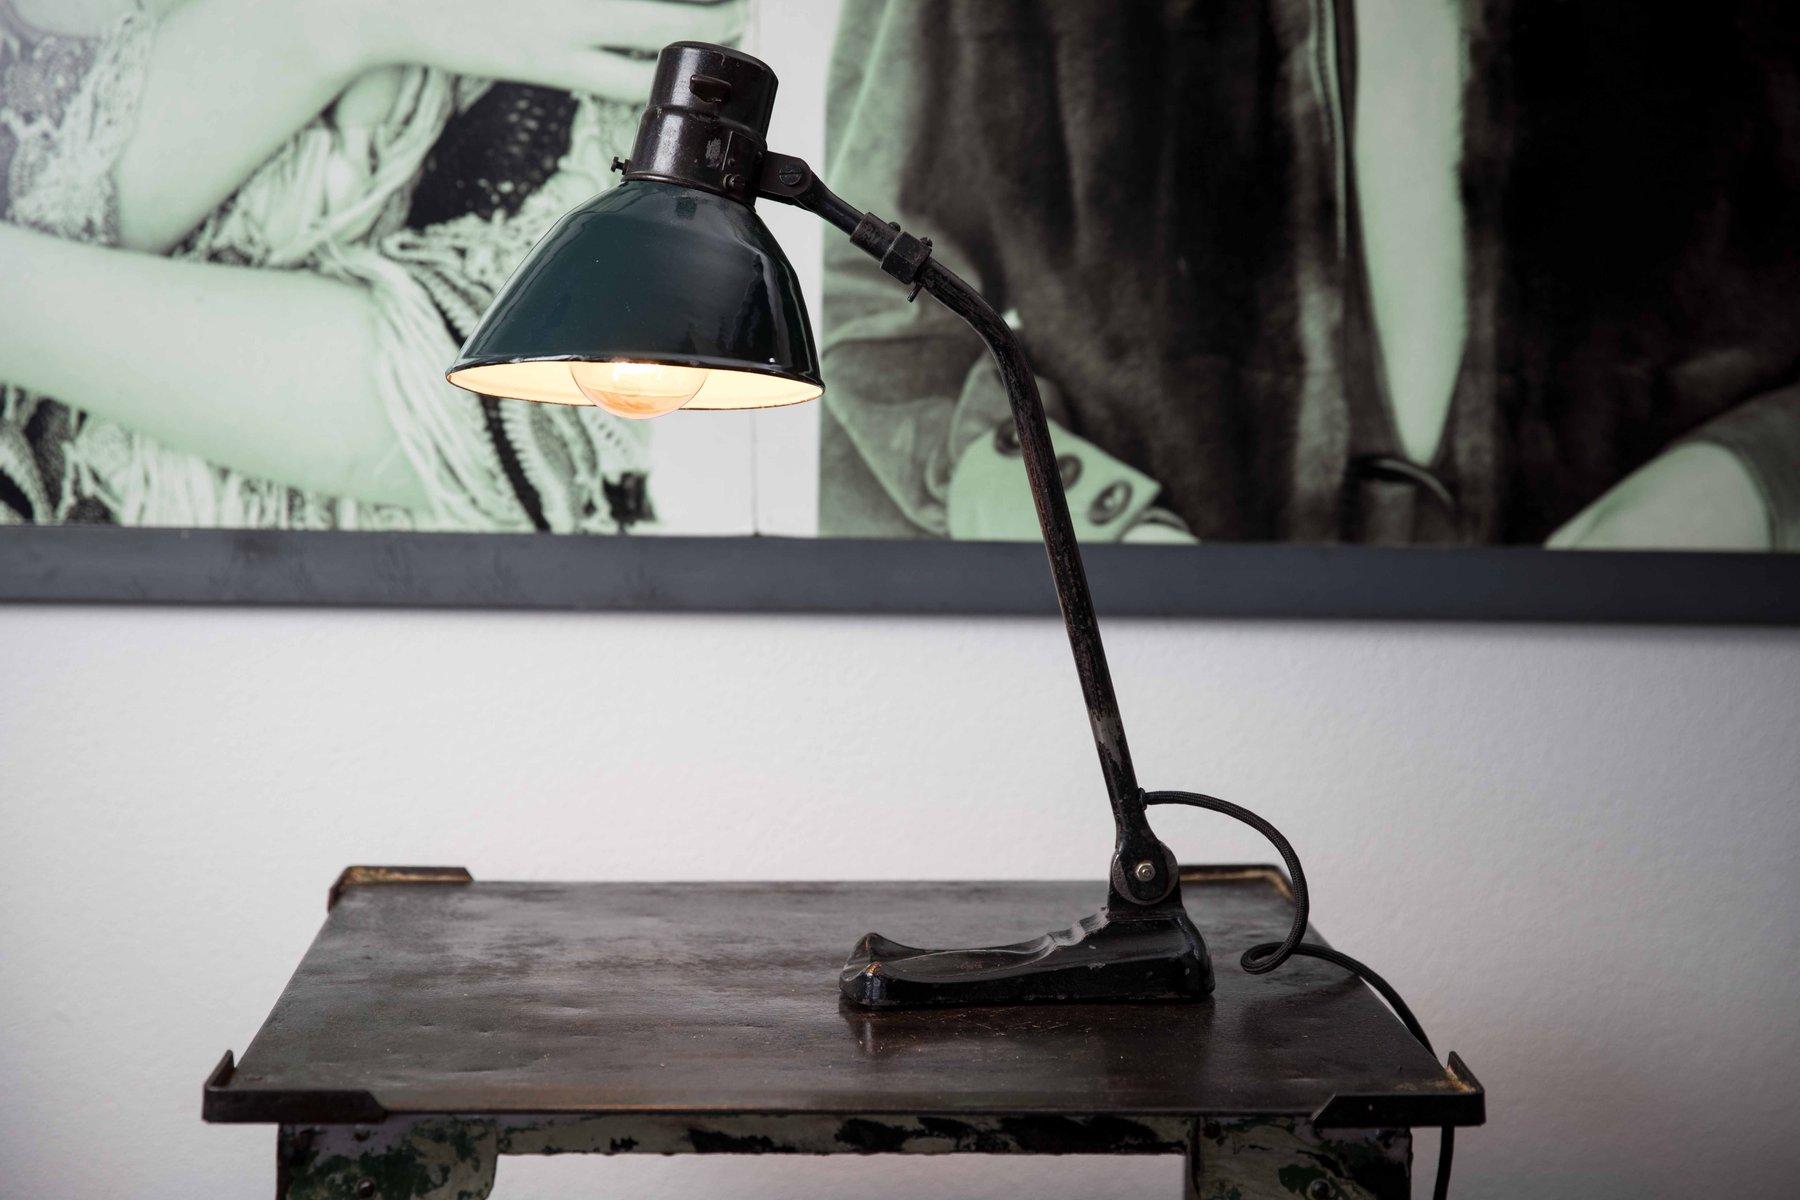 Lampada Vintage Industriale : Lampada da tavolo bolichwerke vintage industriale di ebolicht anni